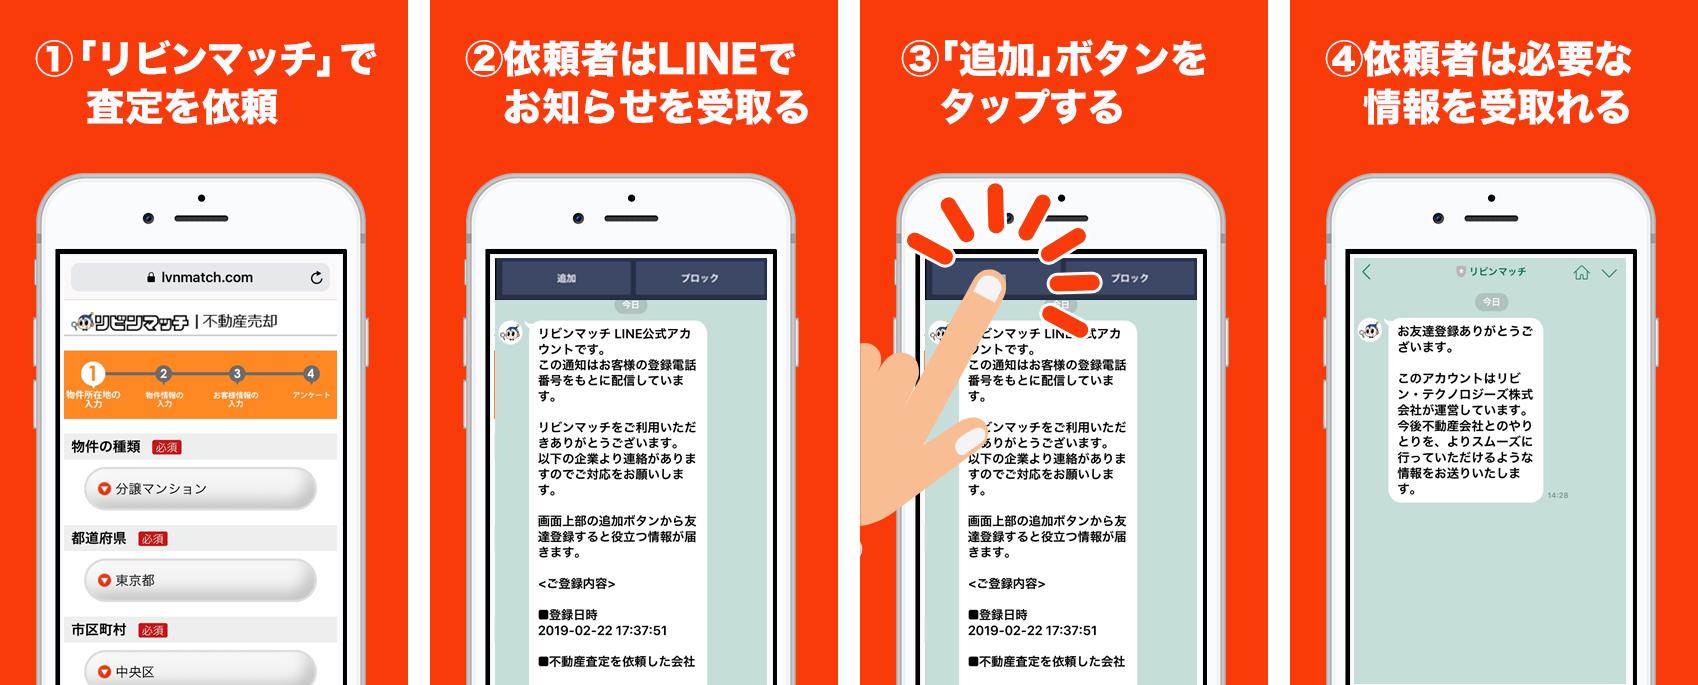 LINE「通知メッセージ」イメージ画像